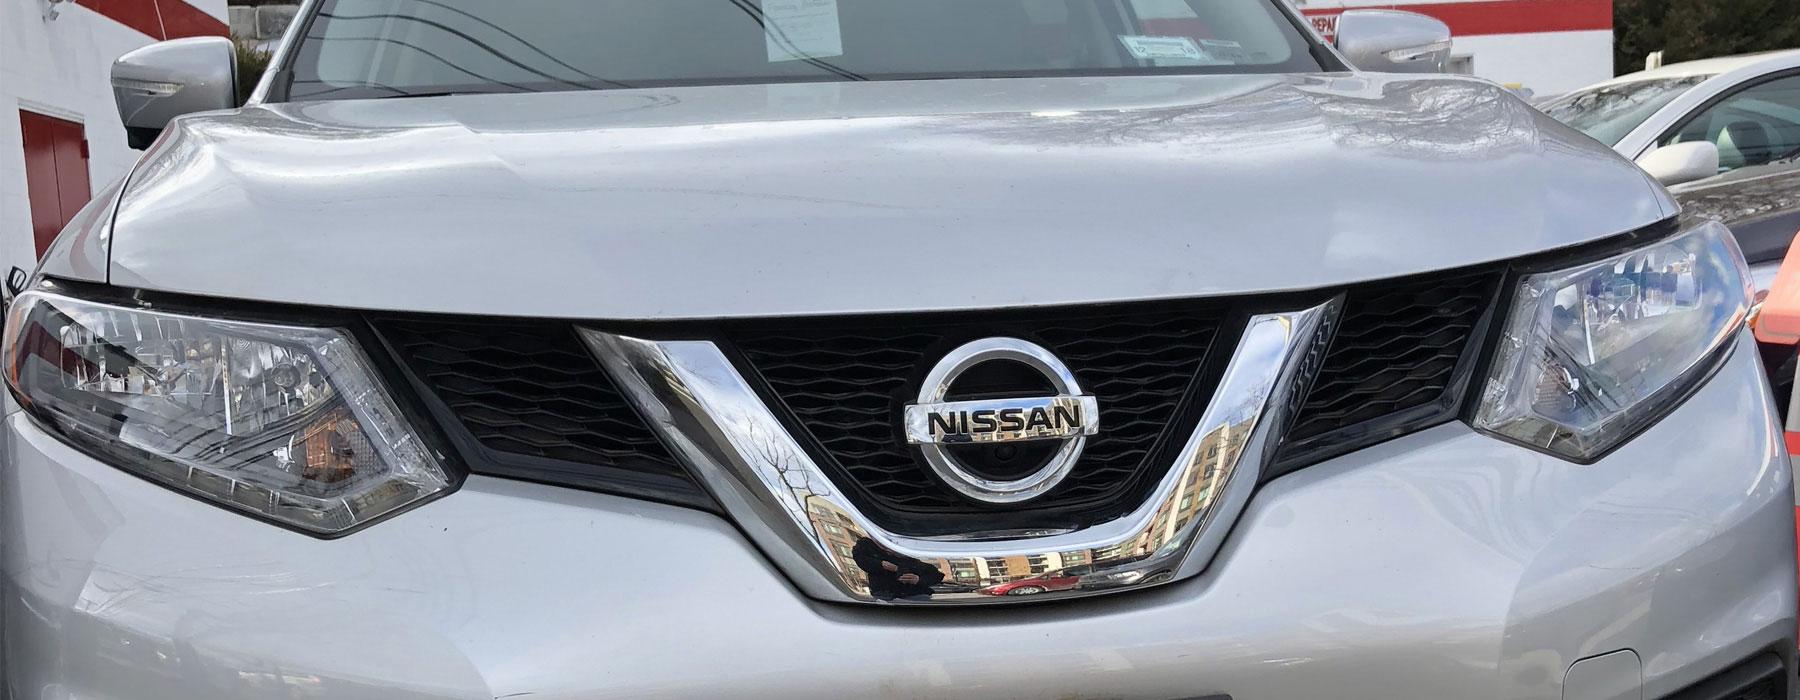 Certifications Nissan